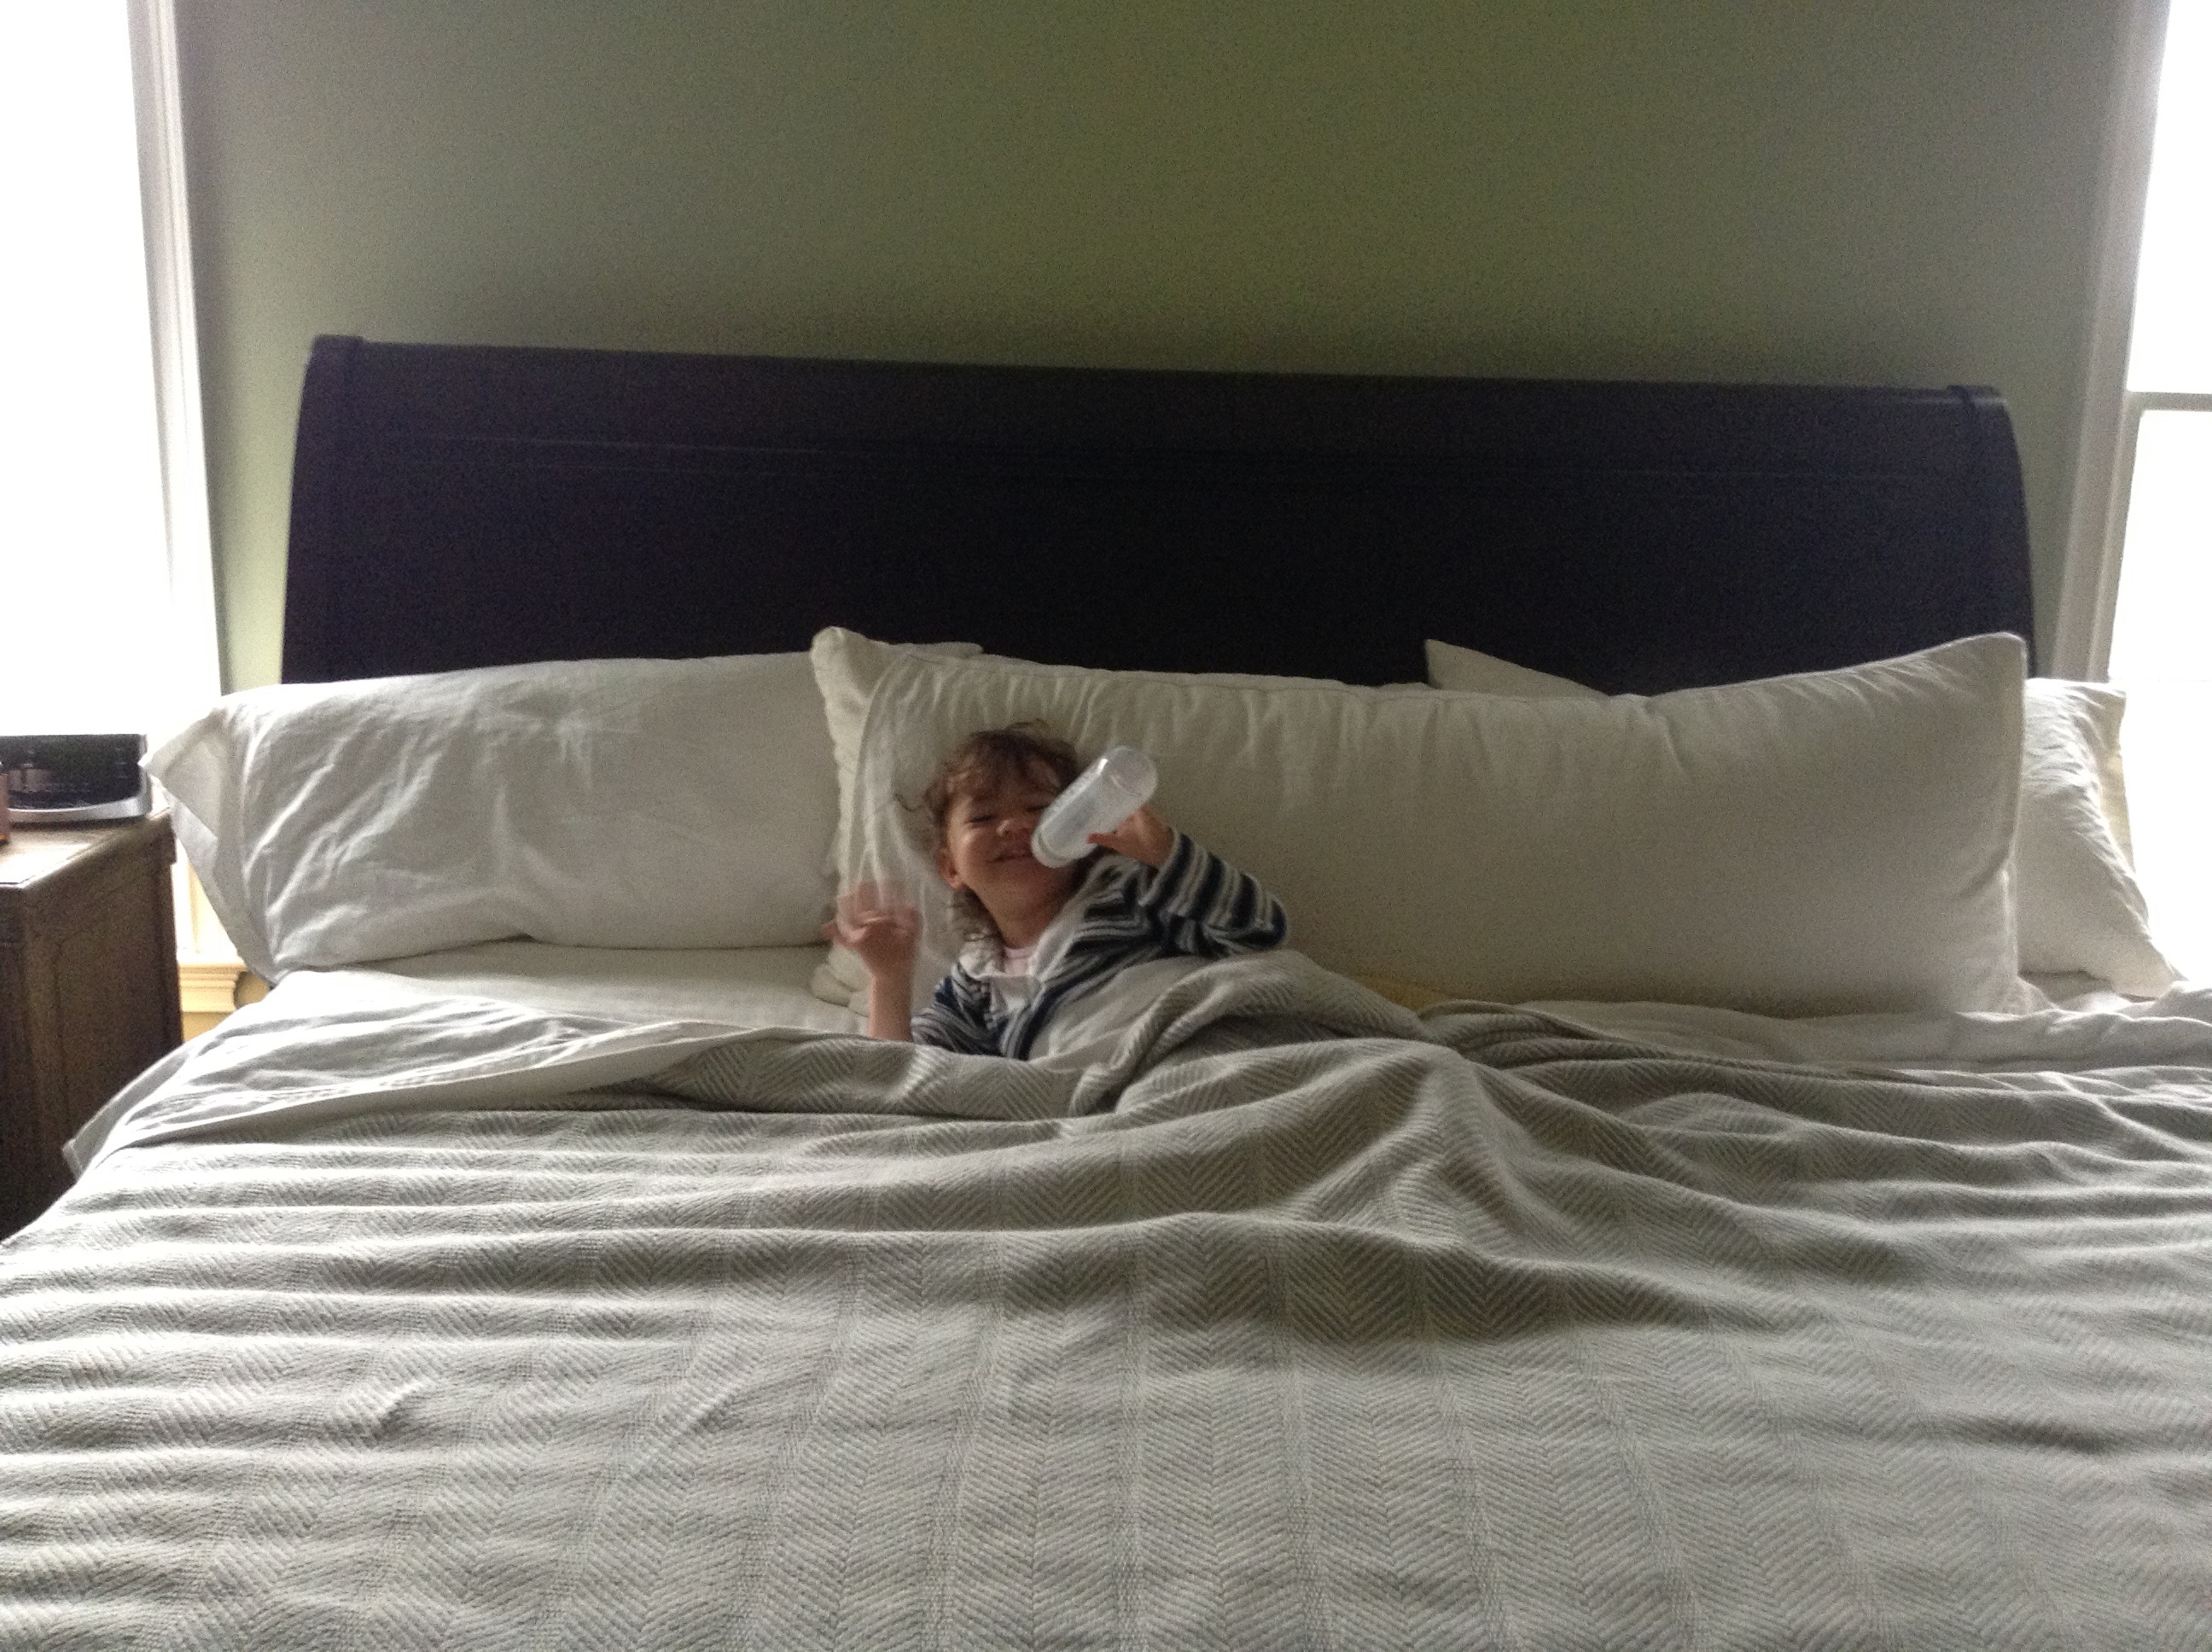 Non-toxic and Eco Friendly Pregnancy/ Pillows | Eco Mama Lists on nursery pillows, cheap pillows, flame retardant pillows, fire retardant pillows, family pillows, furniture pillows, future pillows, food pillows, hypoallergenic pillows, soft pillows, cool pillows,